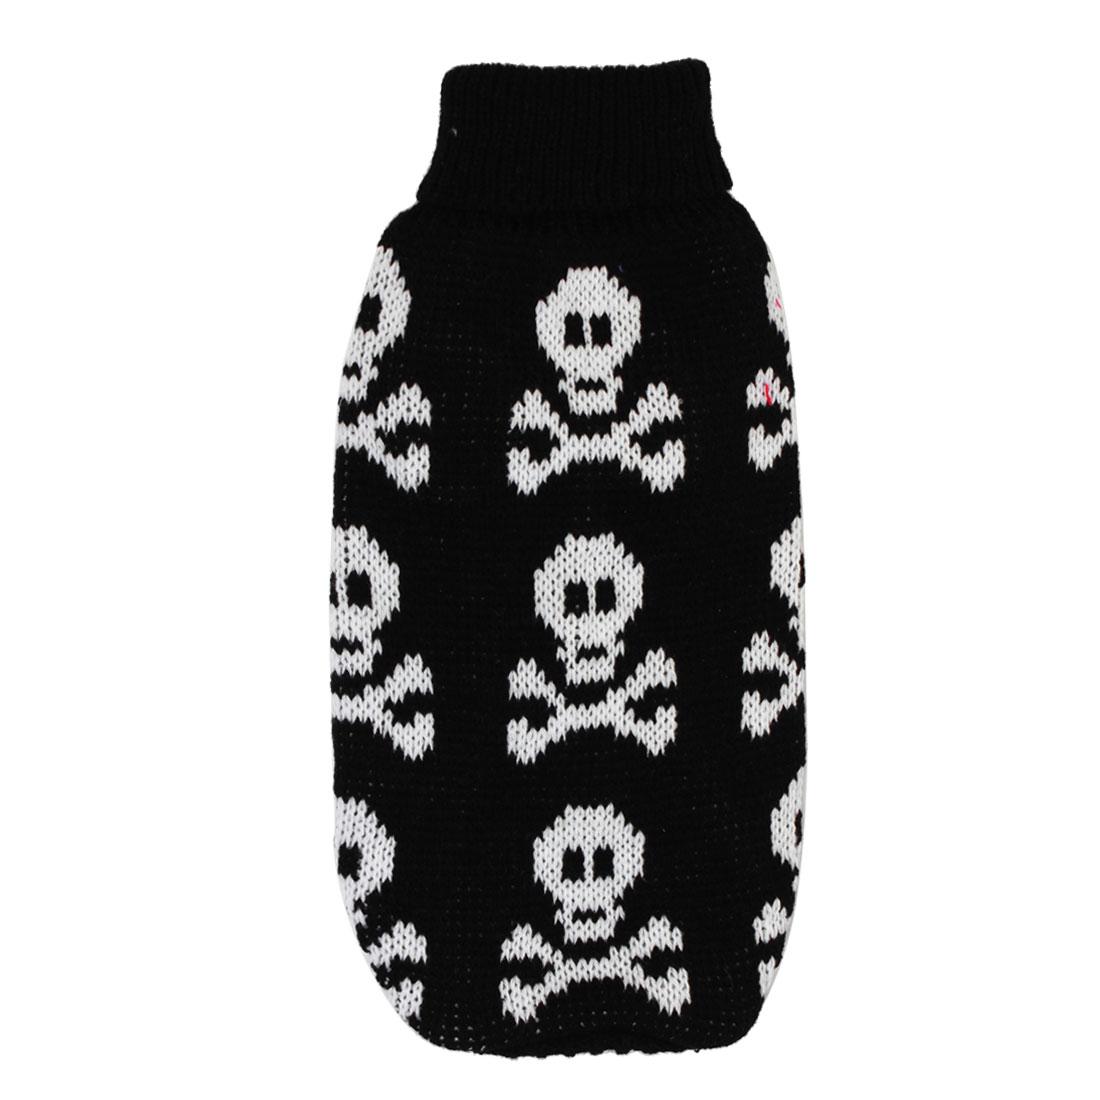 Pet Dog Chihuahua Skull Print Ribbed Cuff Apparel Coat Sweater Black White XS(China (Mainland))